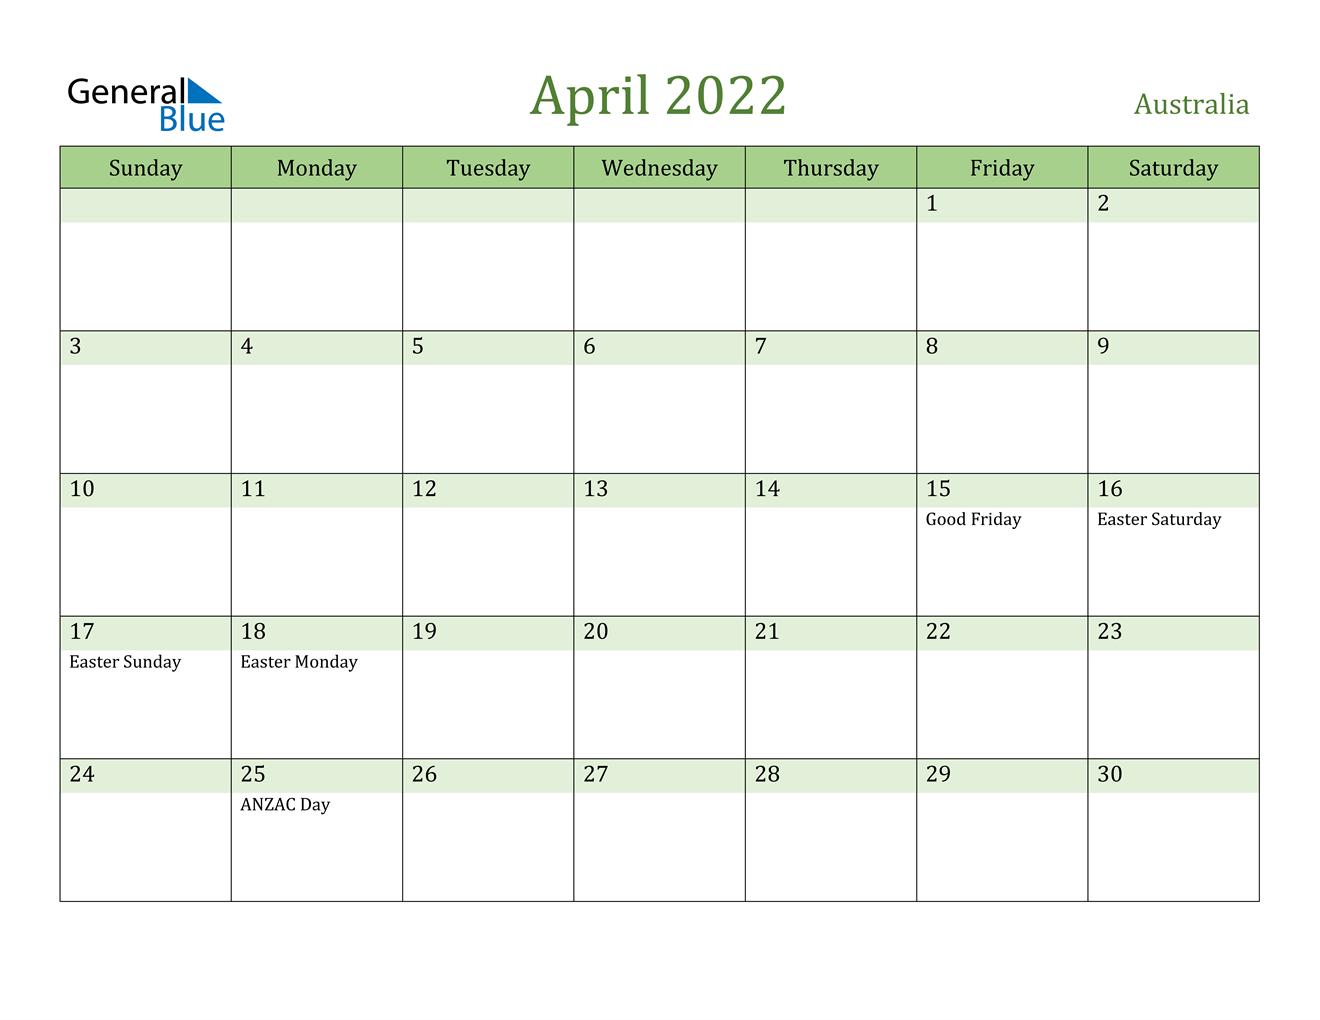 April 2022 Calendar - Australia pertaining to April 2022 Calendar Printable